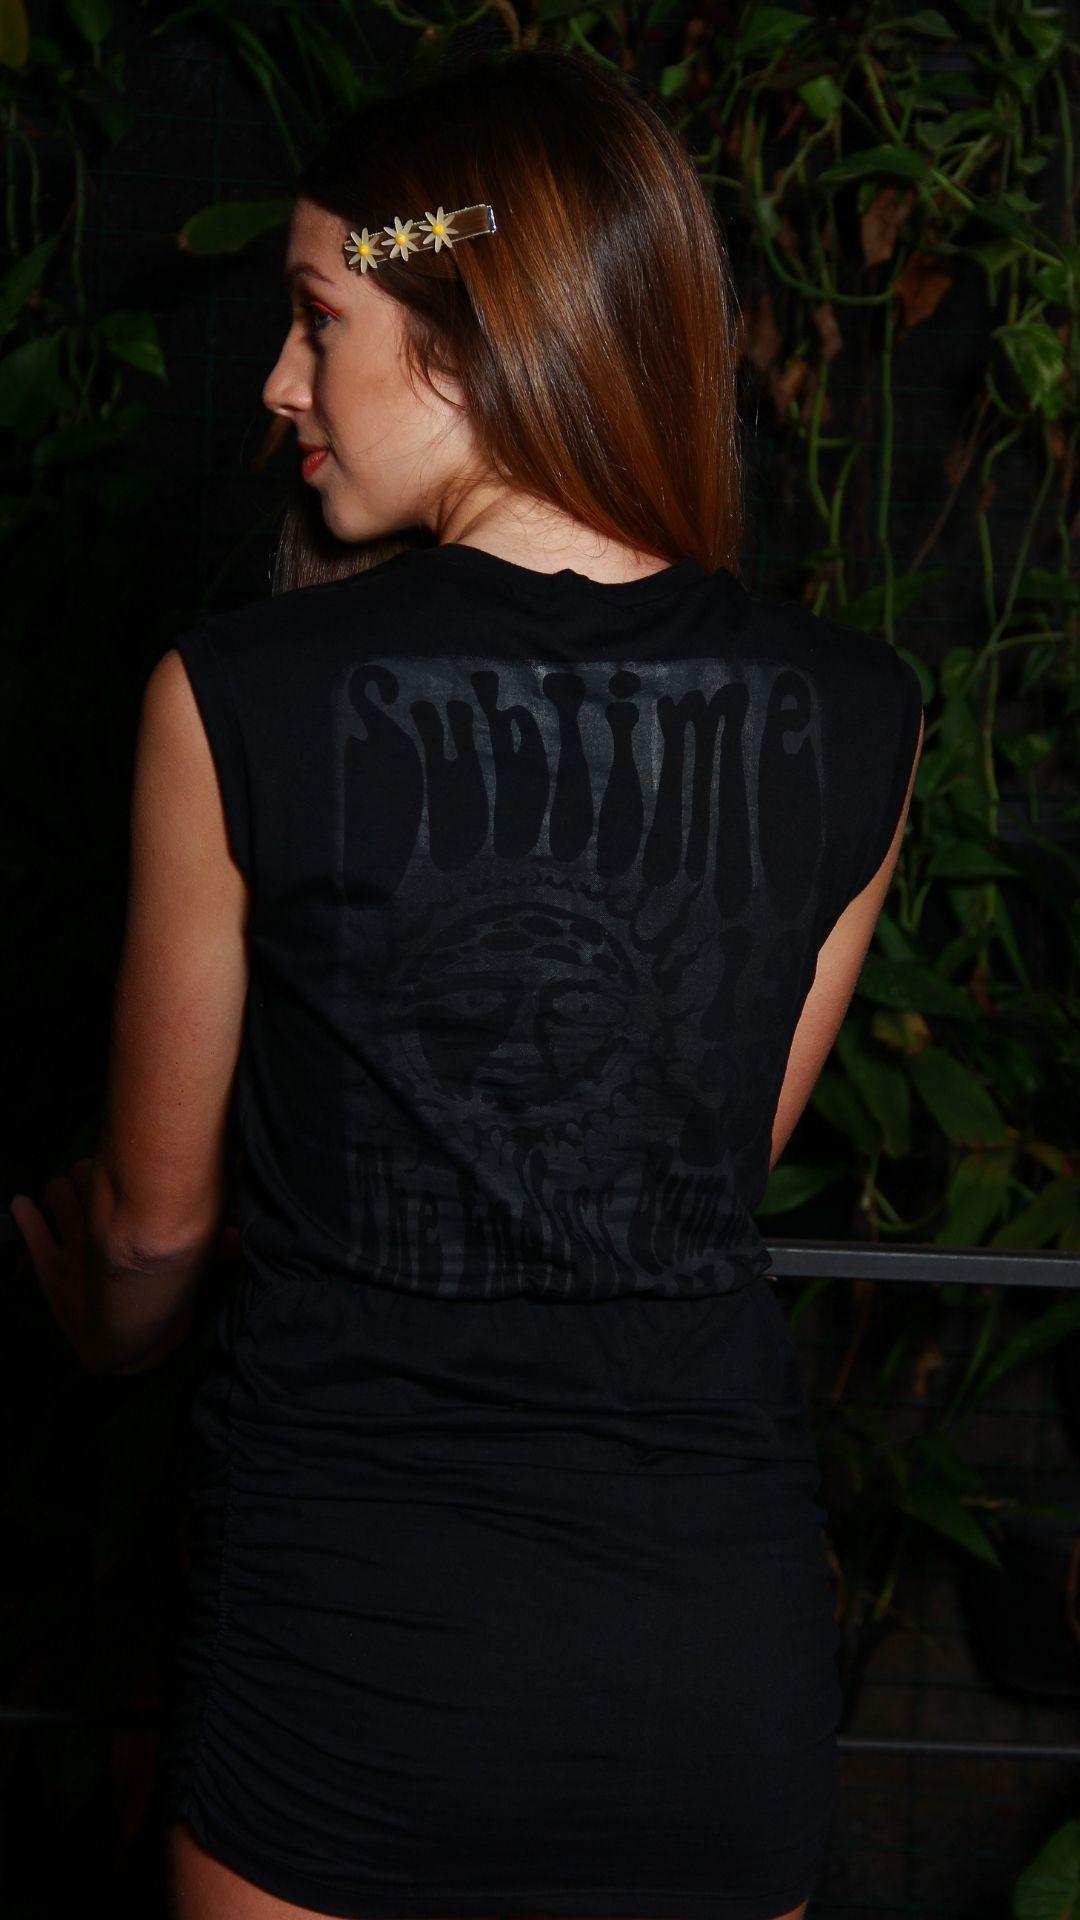 Vestido Tee Sublime  - Metro & Co.